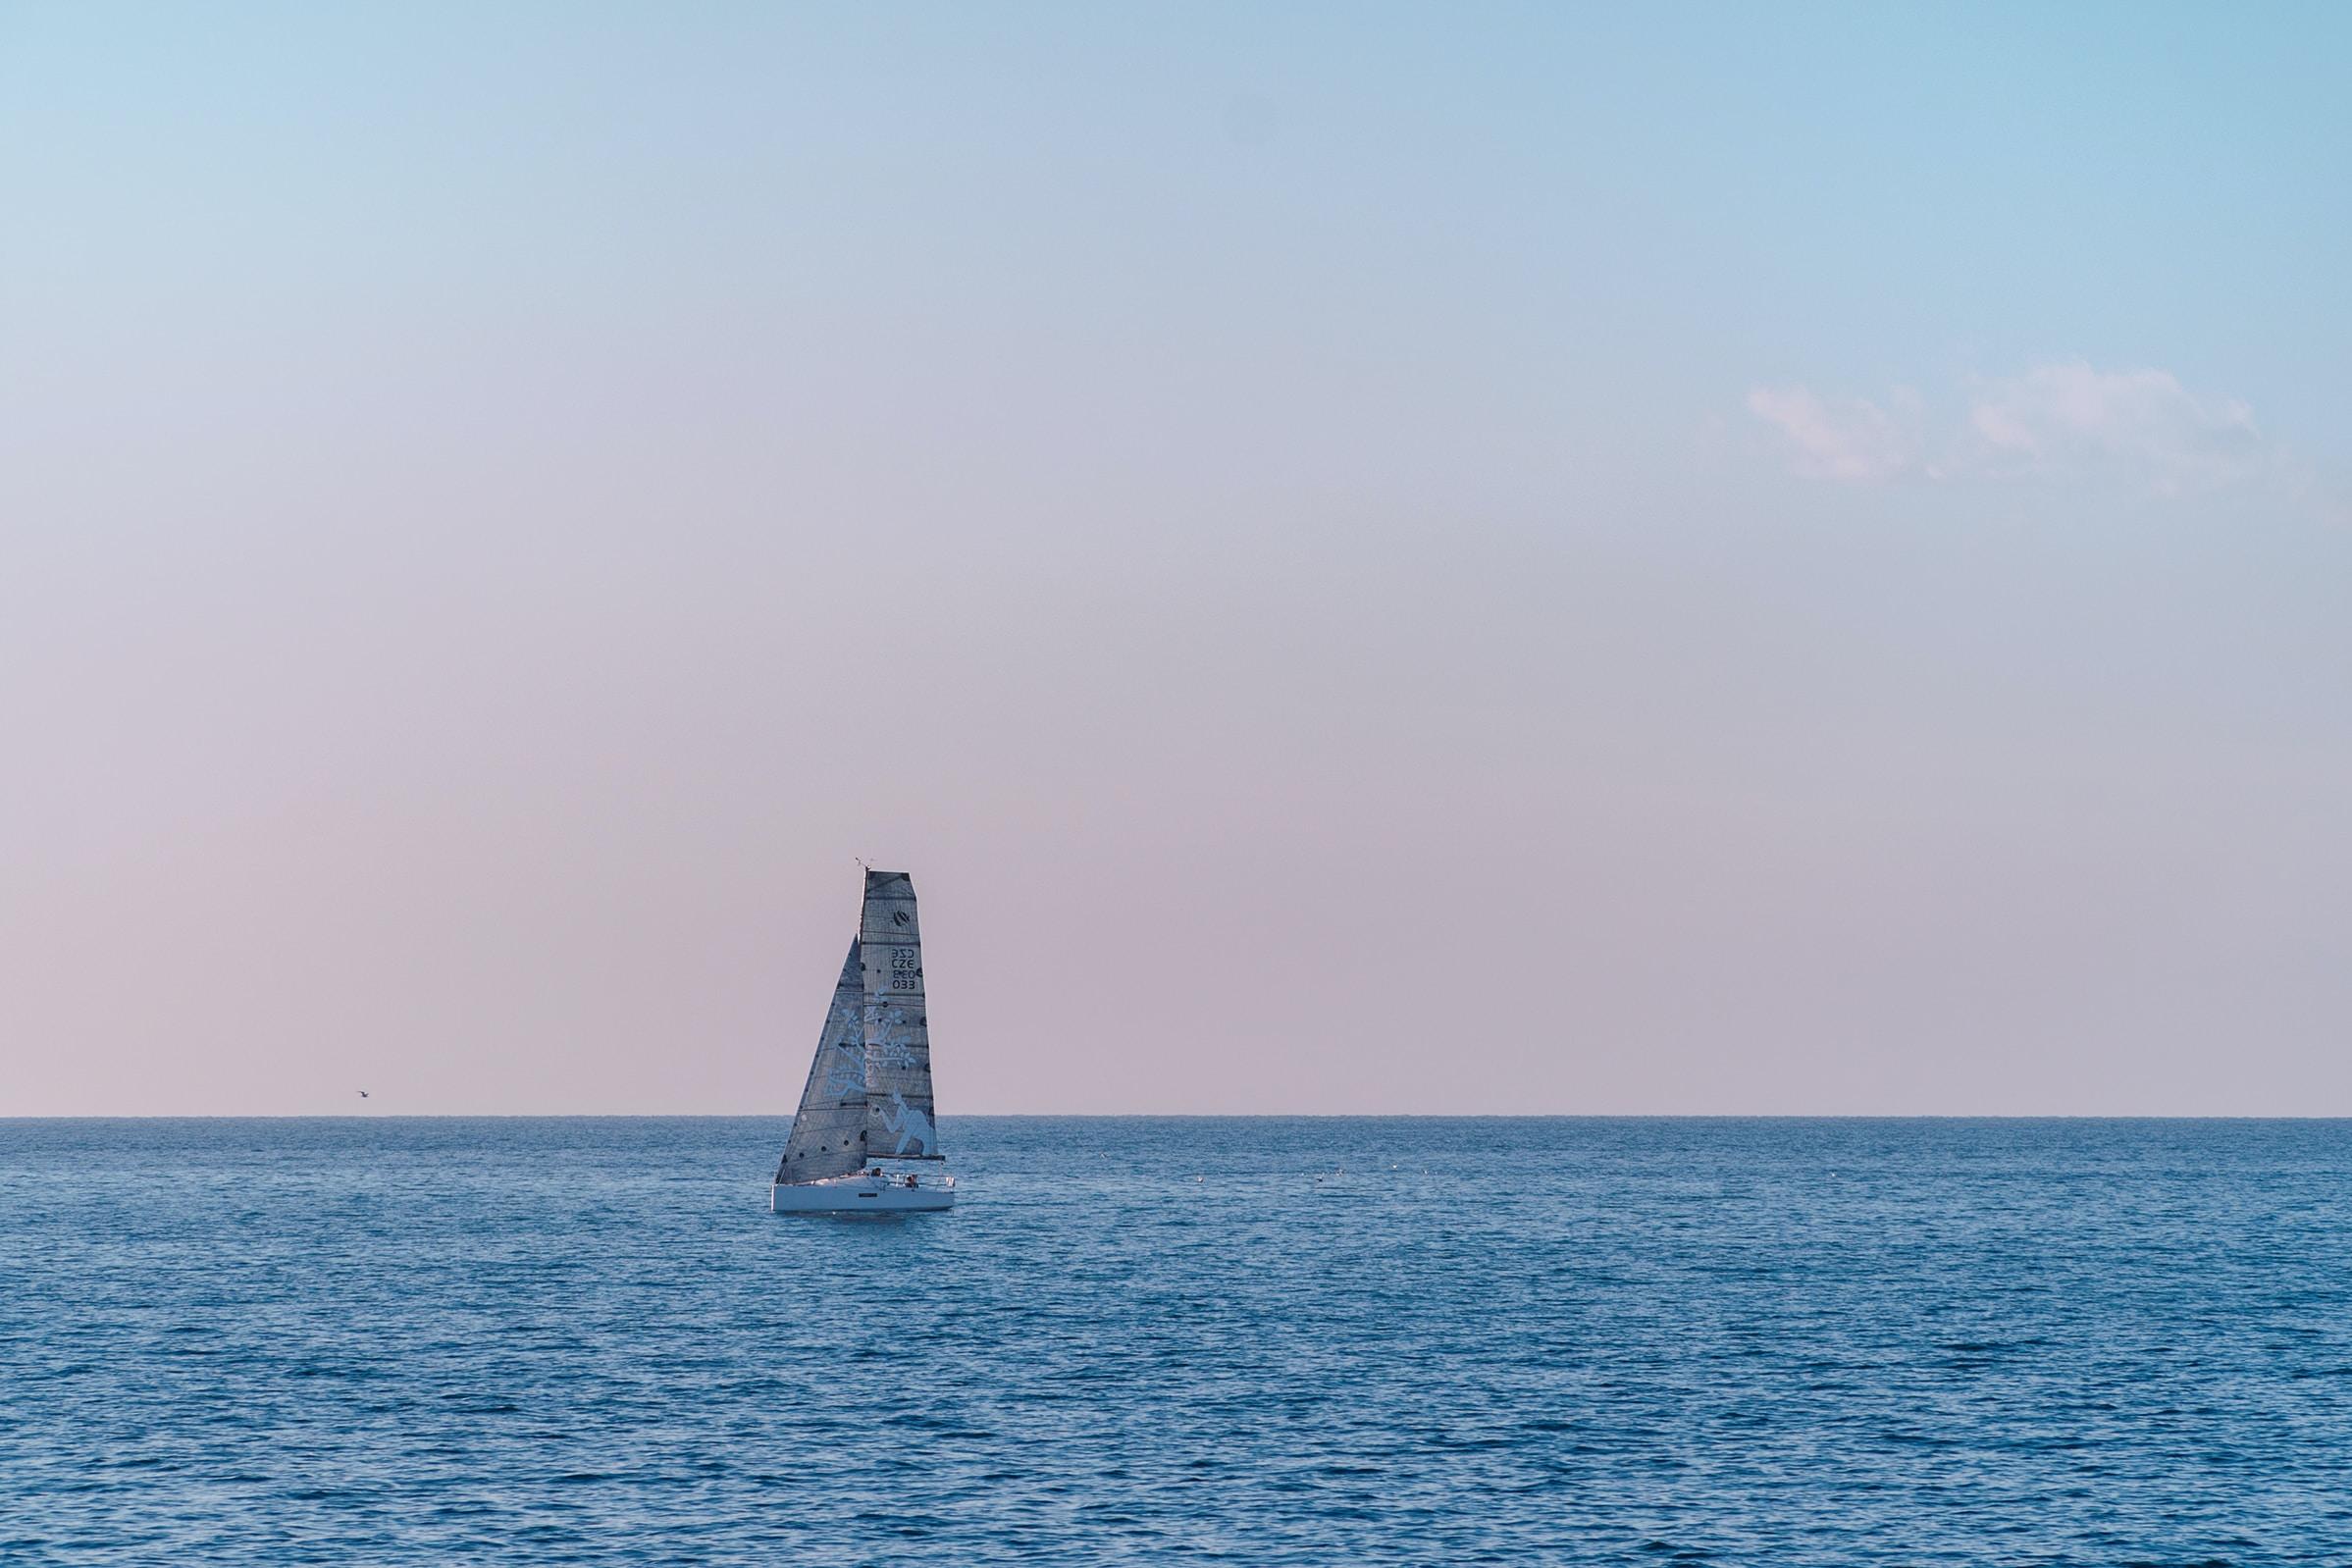 white sailboat on ocean during daytime